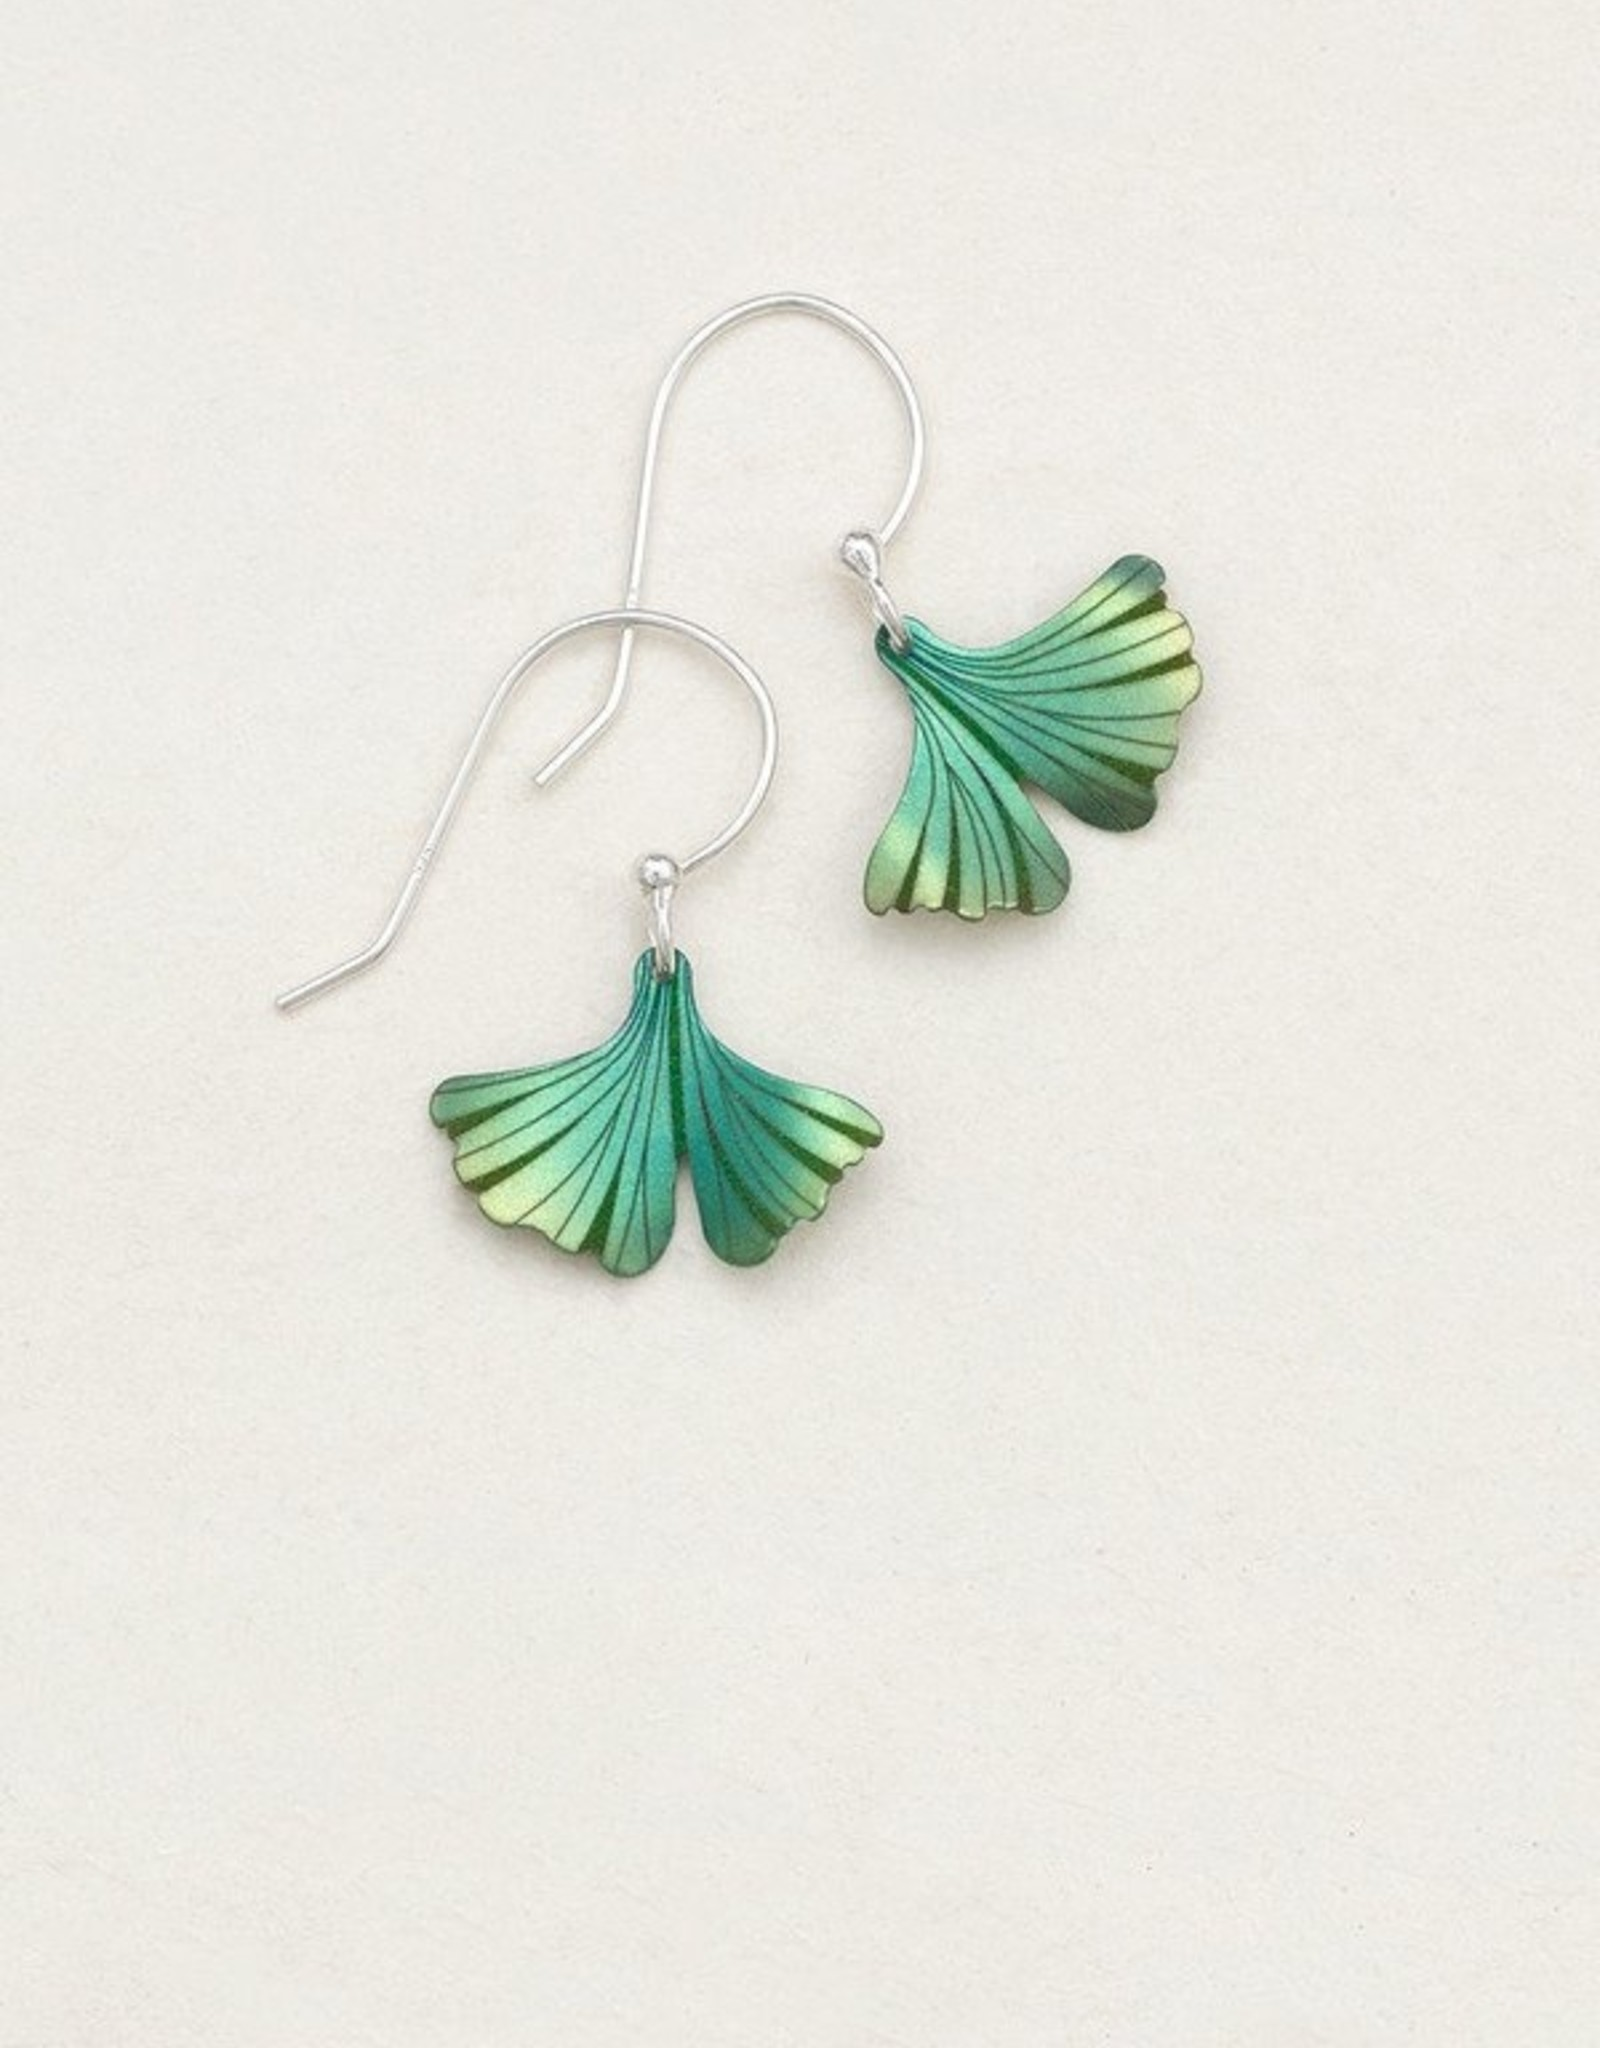 Holly Yashi Turquoise/ Green Petite Ginkgo Earrings